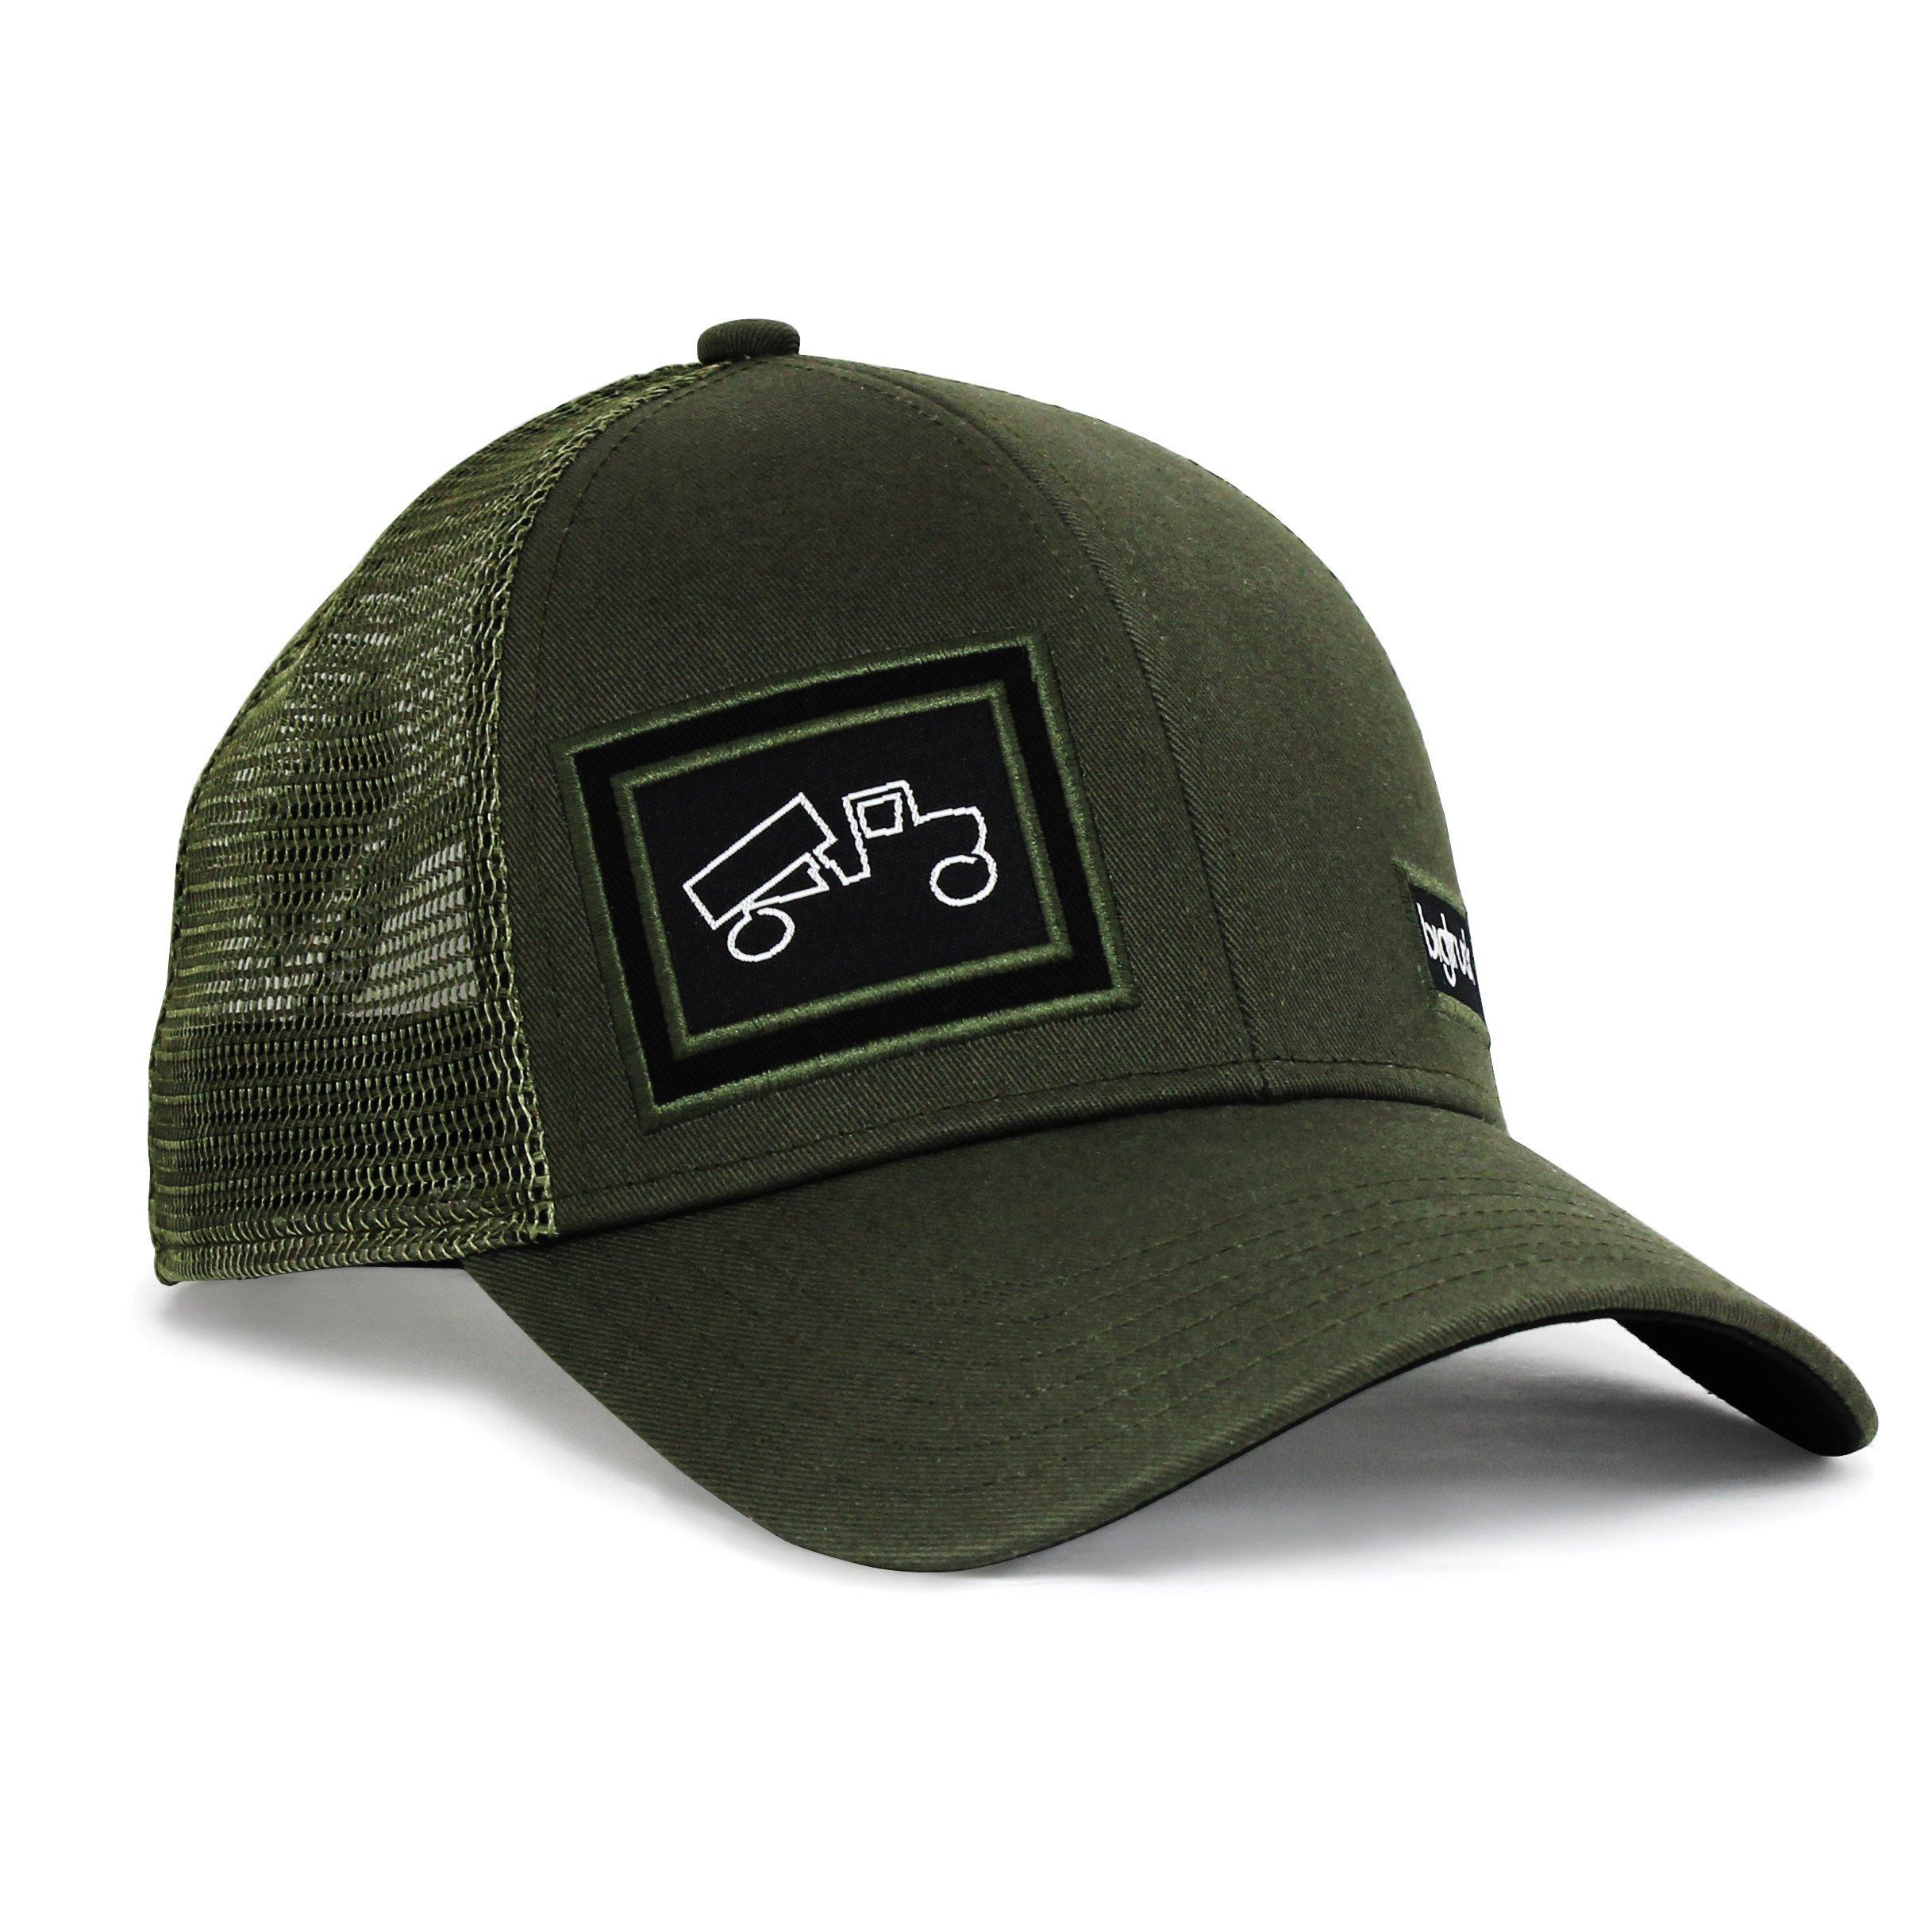 bigtruck Classic Trucker Hat, Olive, Adult